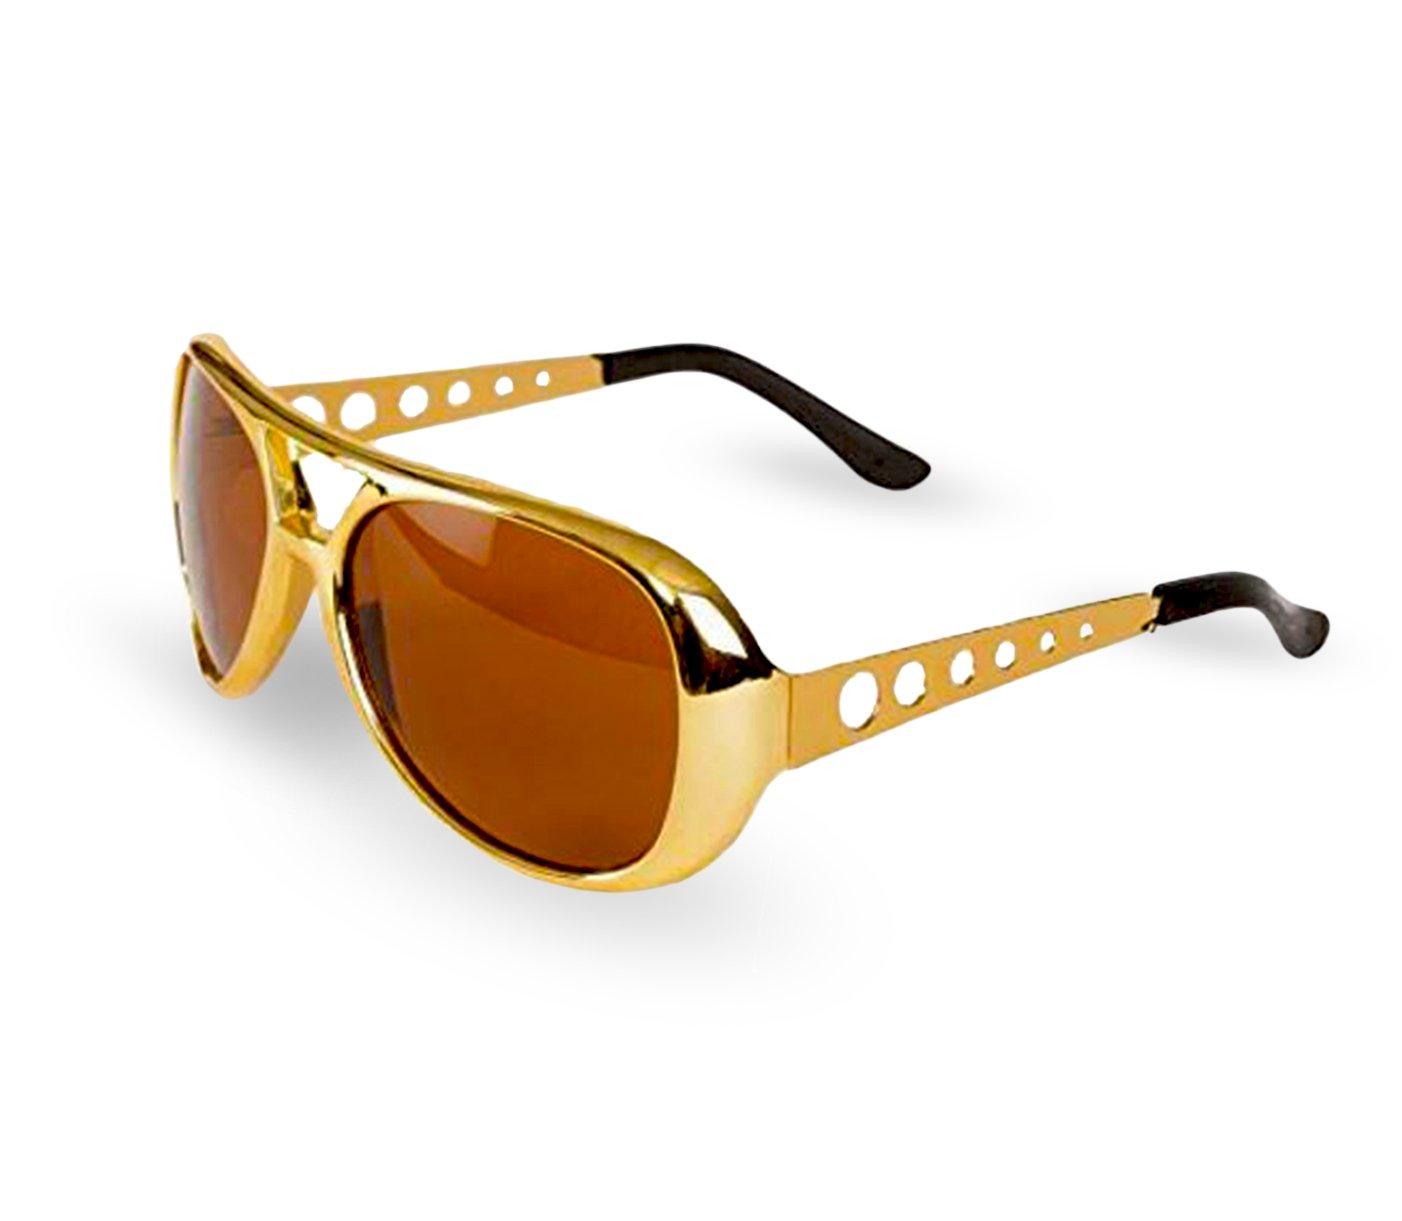 Big Mo's Toys Elvis Rockstar 50's, 60's Style Aviator Shades, Gold Celebrity Sunglasses 1 Pair PR Sunglasses